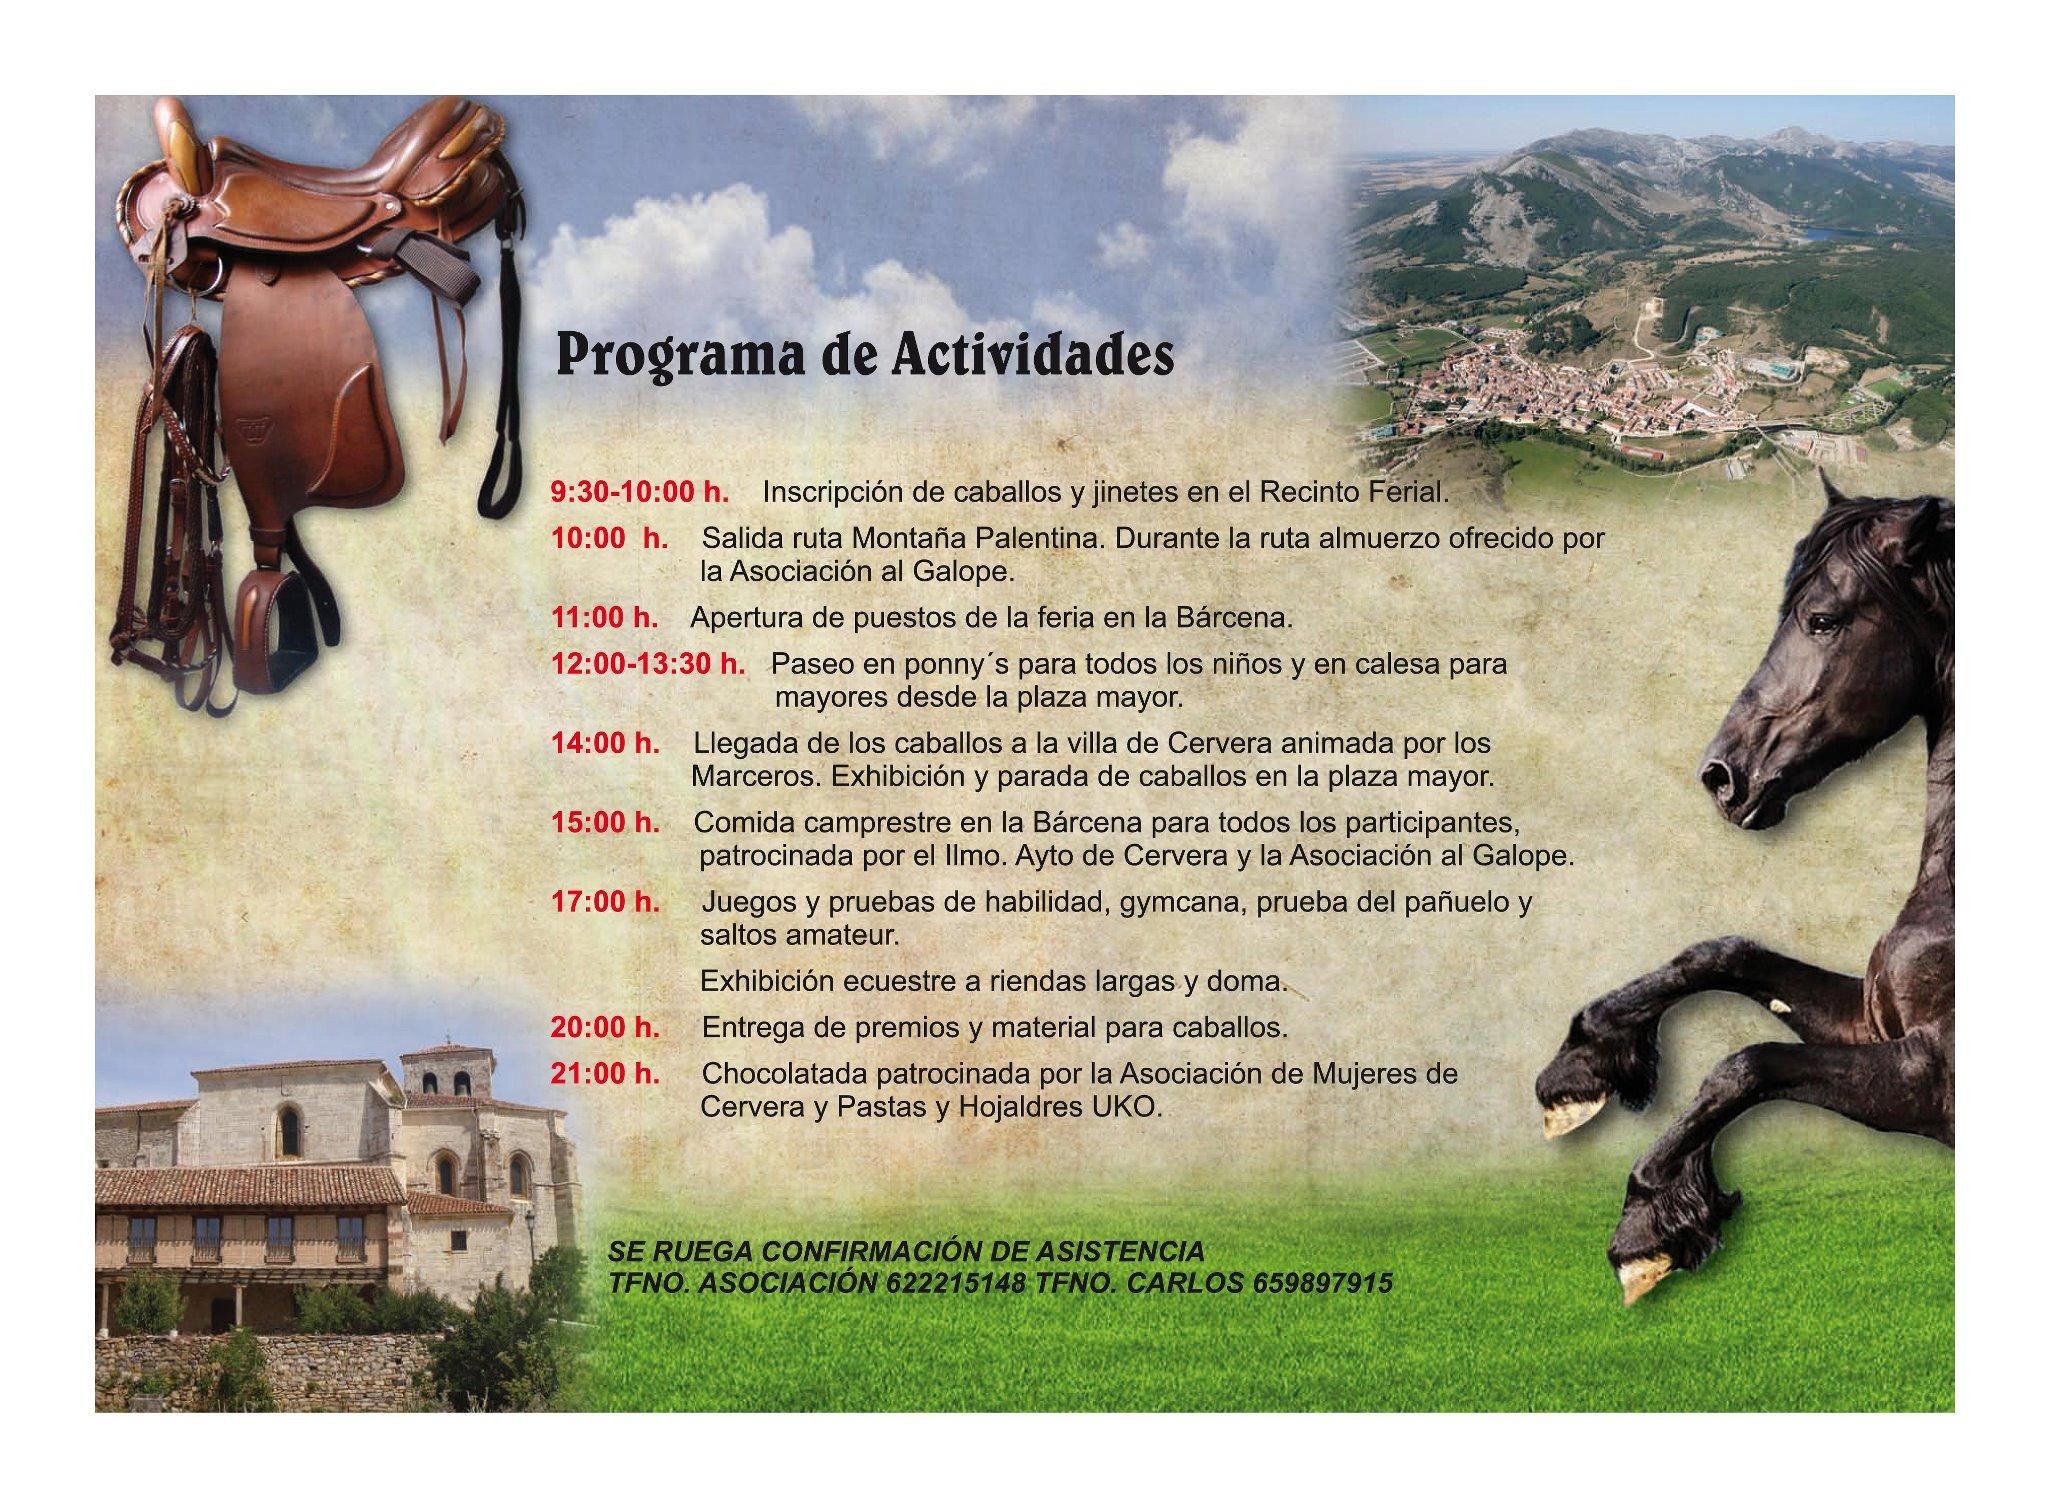 Programa de actividades de la 2ª Feria Ecuestre de Cervera de Pisuerga